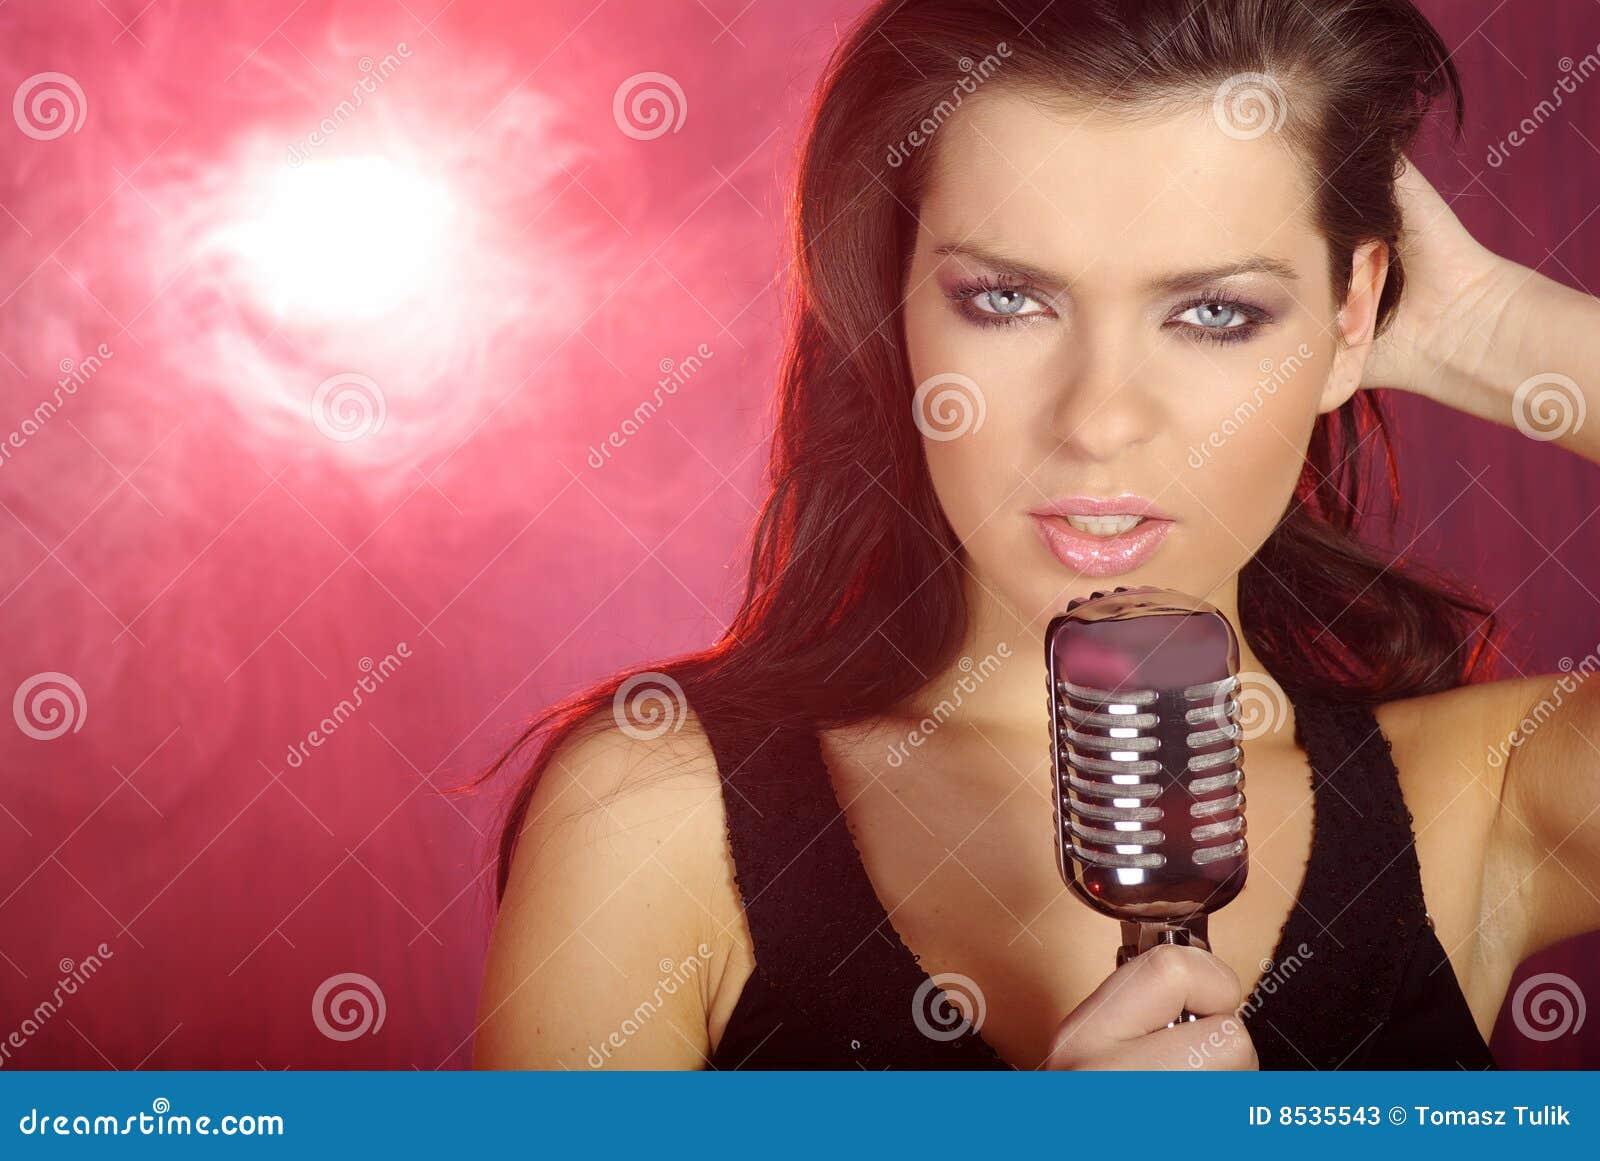 singing the girl retro - photo #2